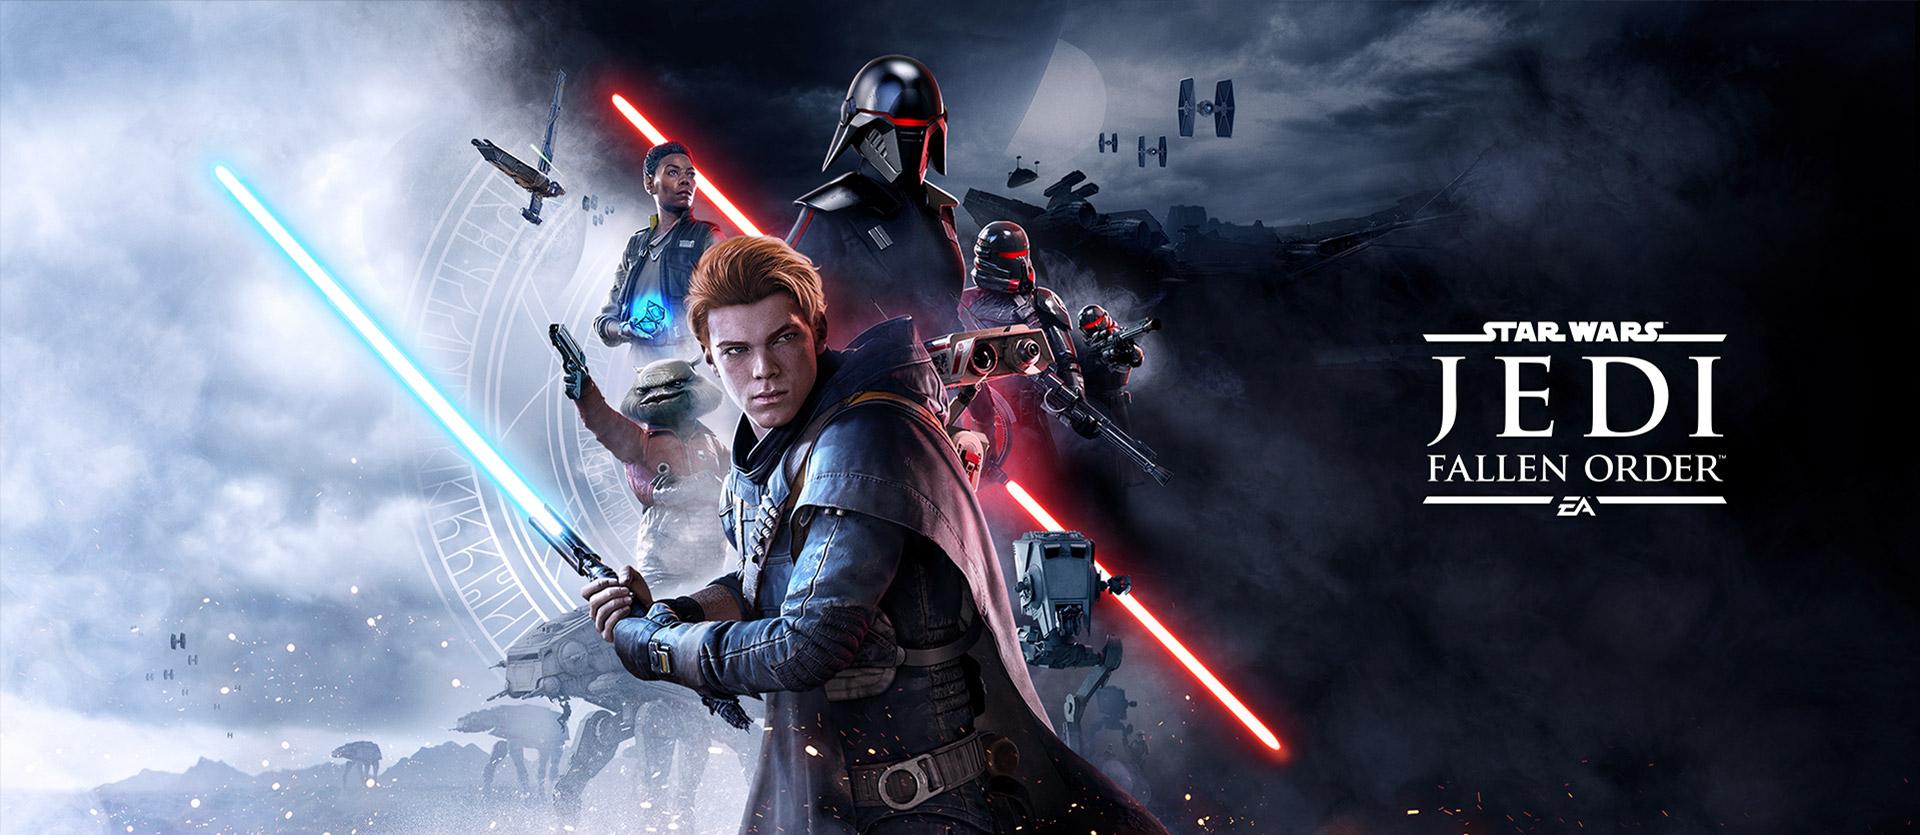 Star Wars Jedi Fallen Order For Xbox One Xbox